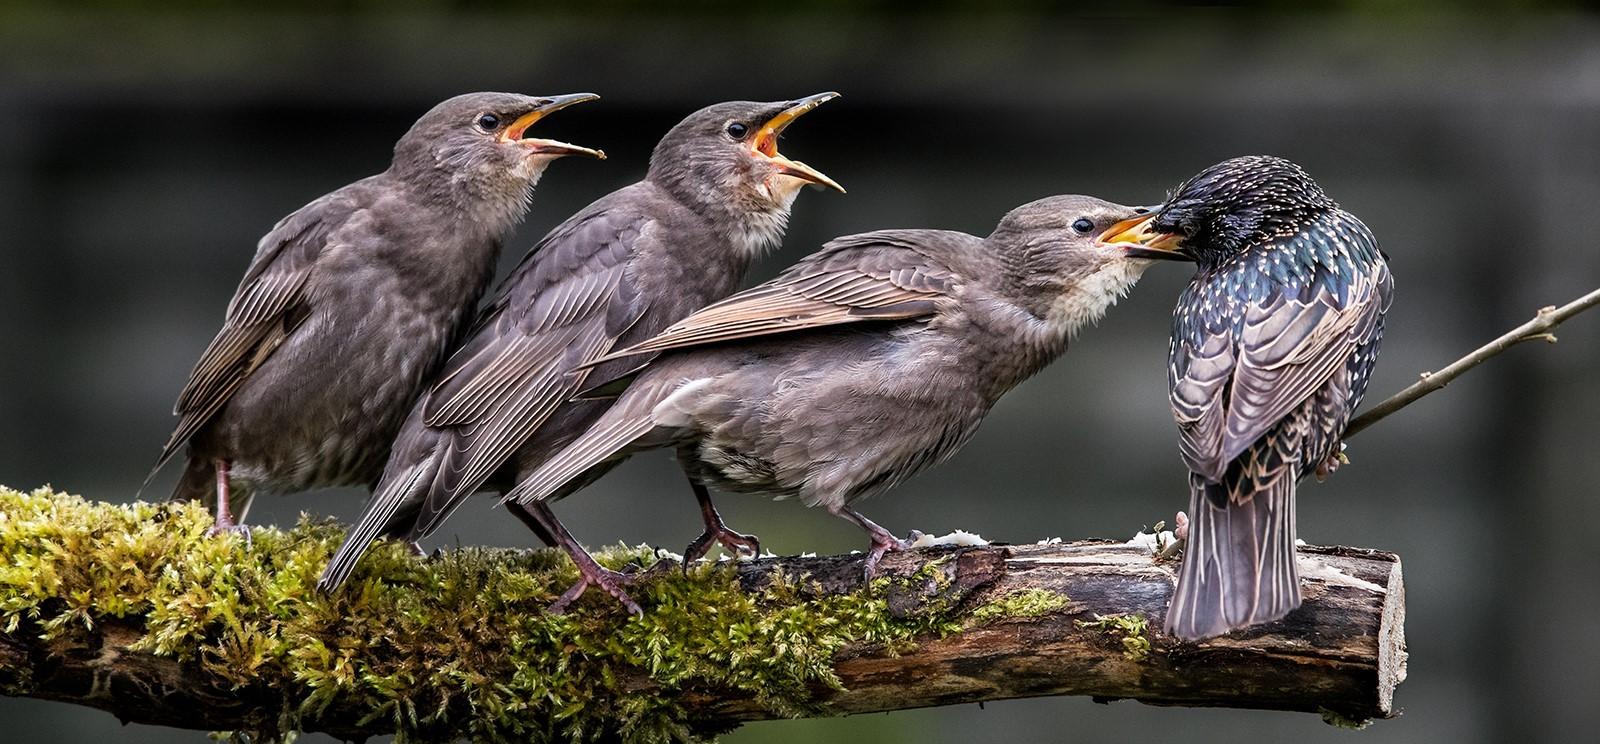 Three Juvenile Starlings feeding